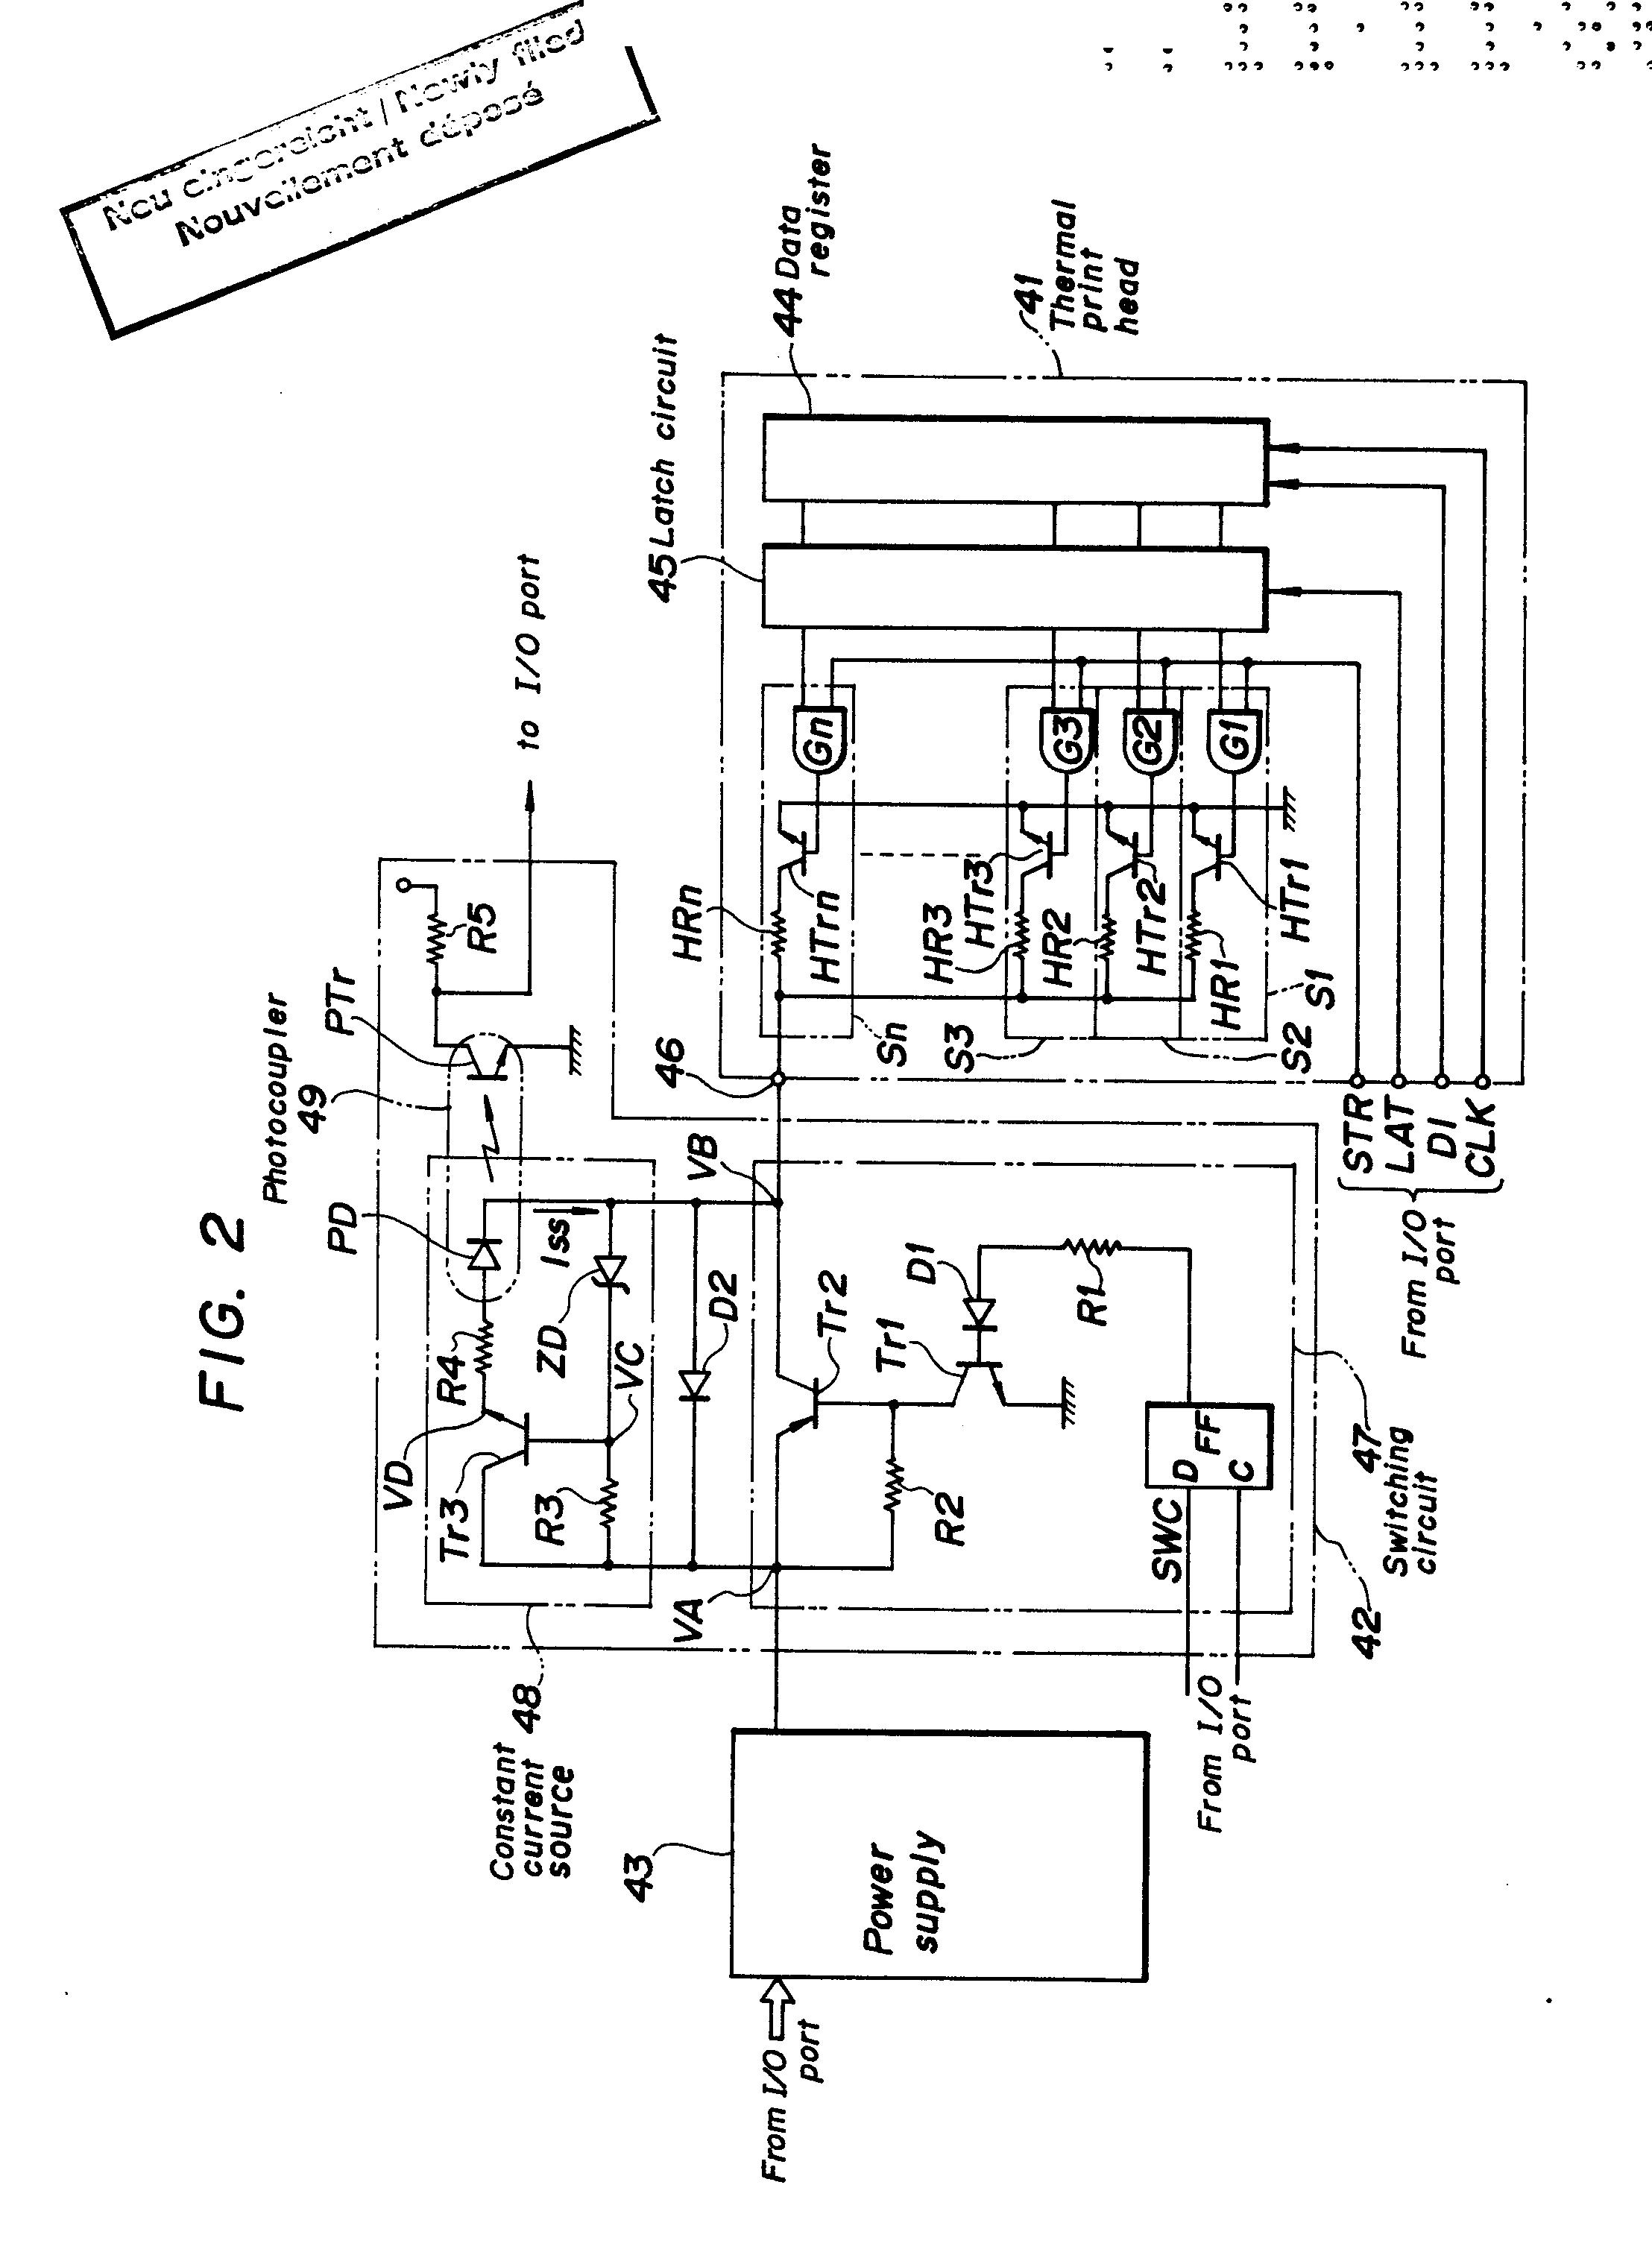 patent ep0217044a1